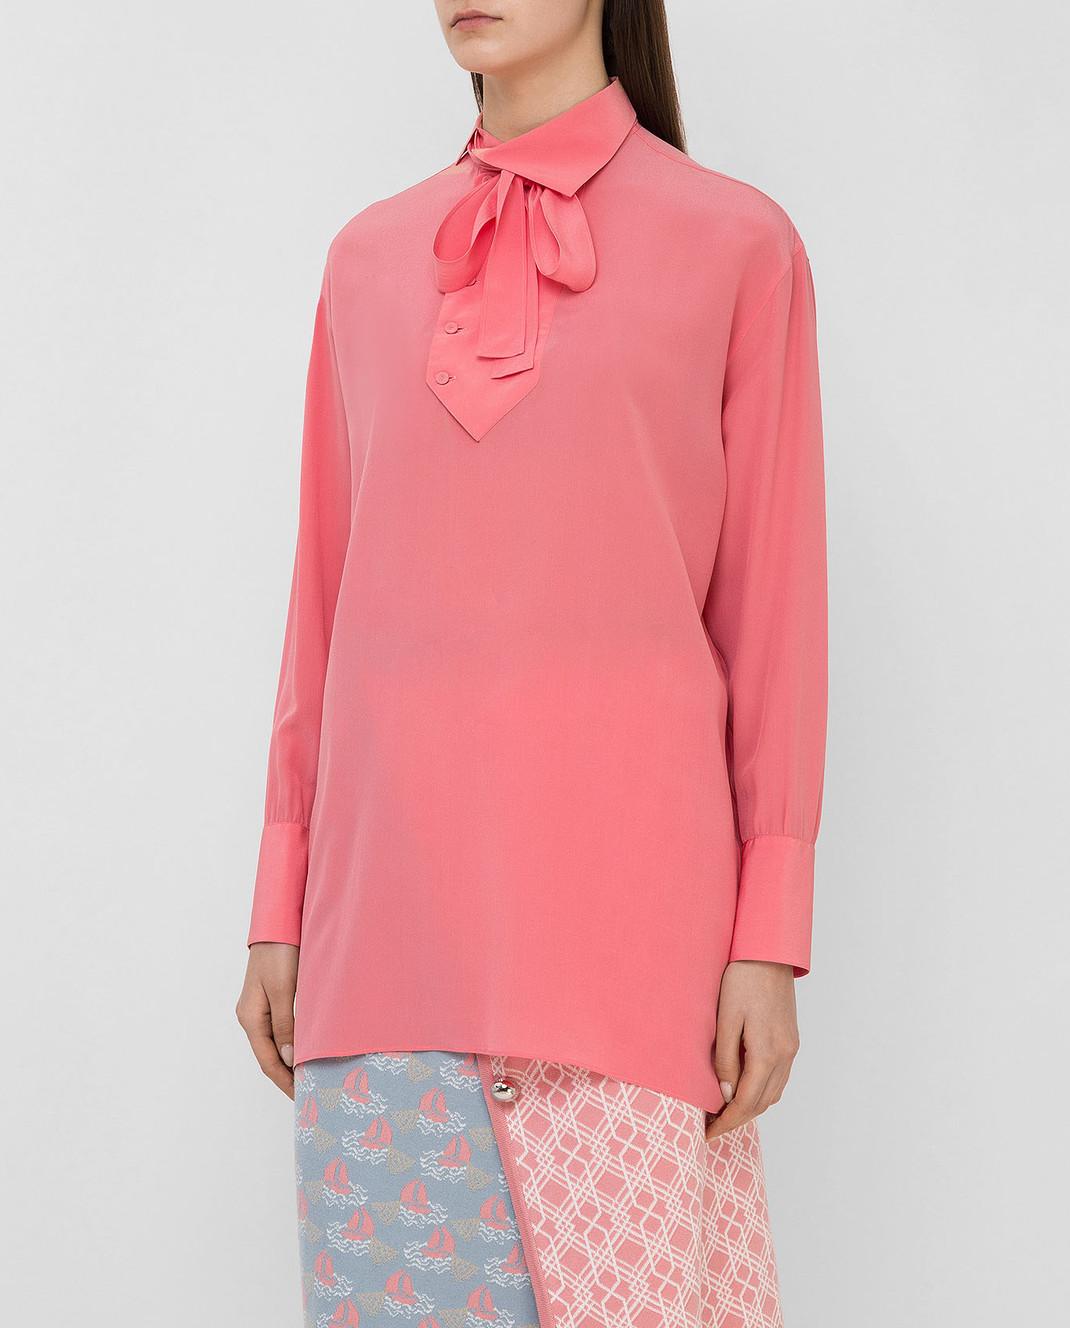 Valentino Коралловая блуза из шелка MB0AB08F21B изображение 3